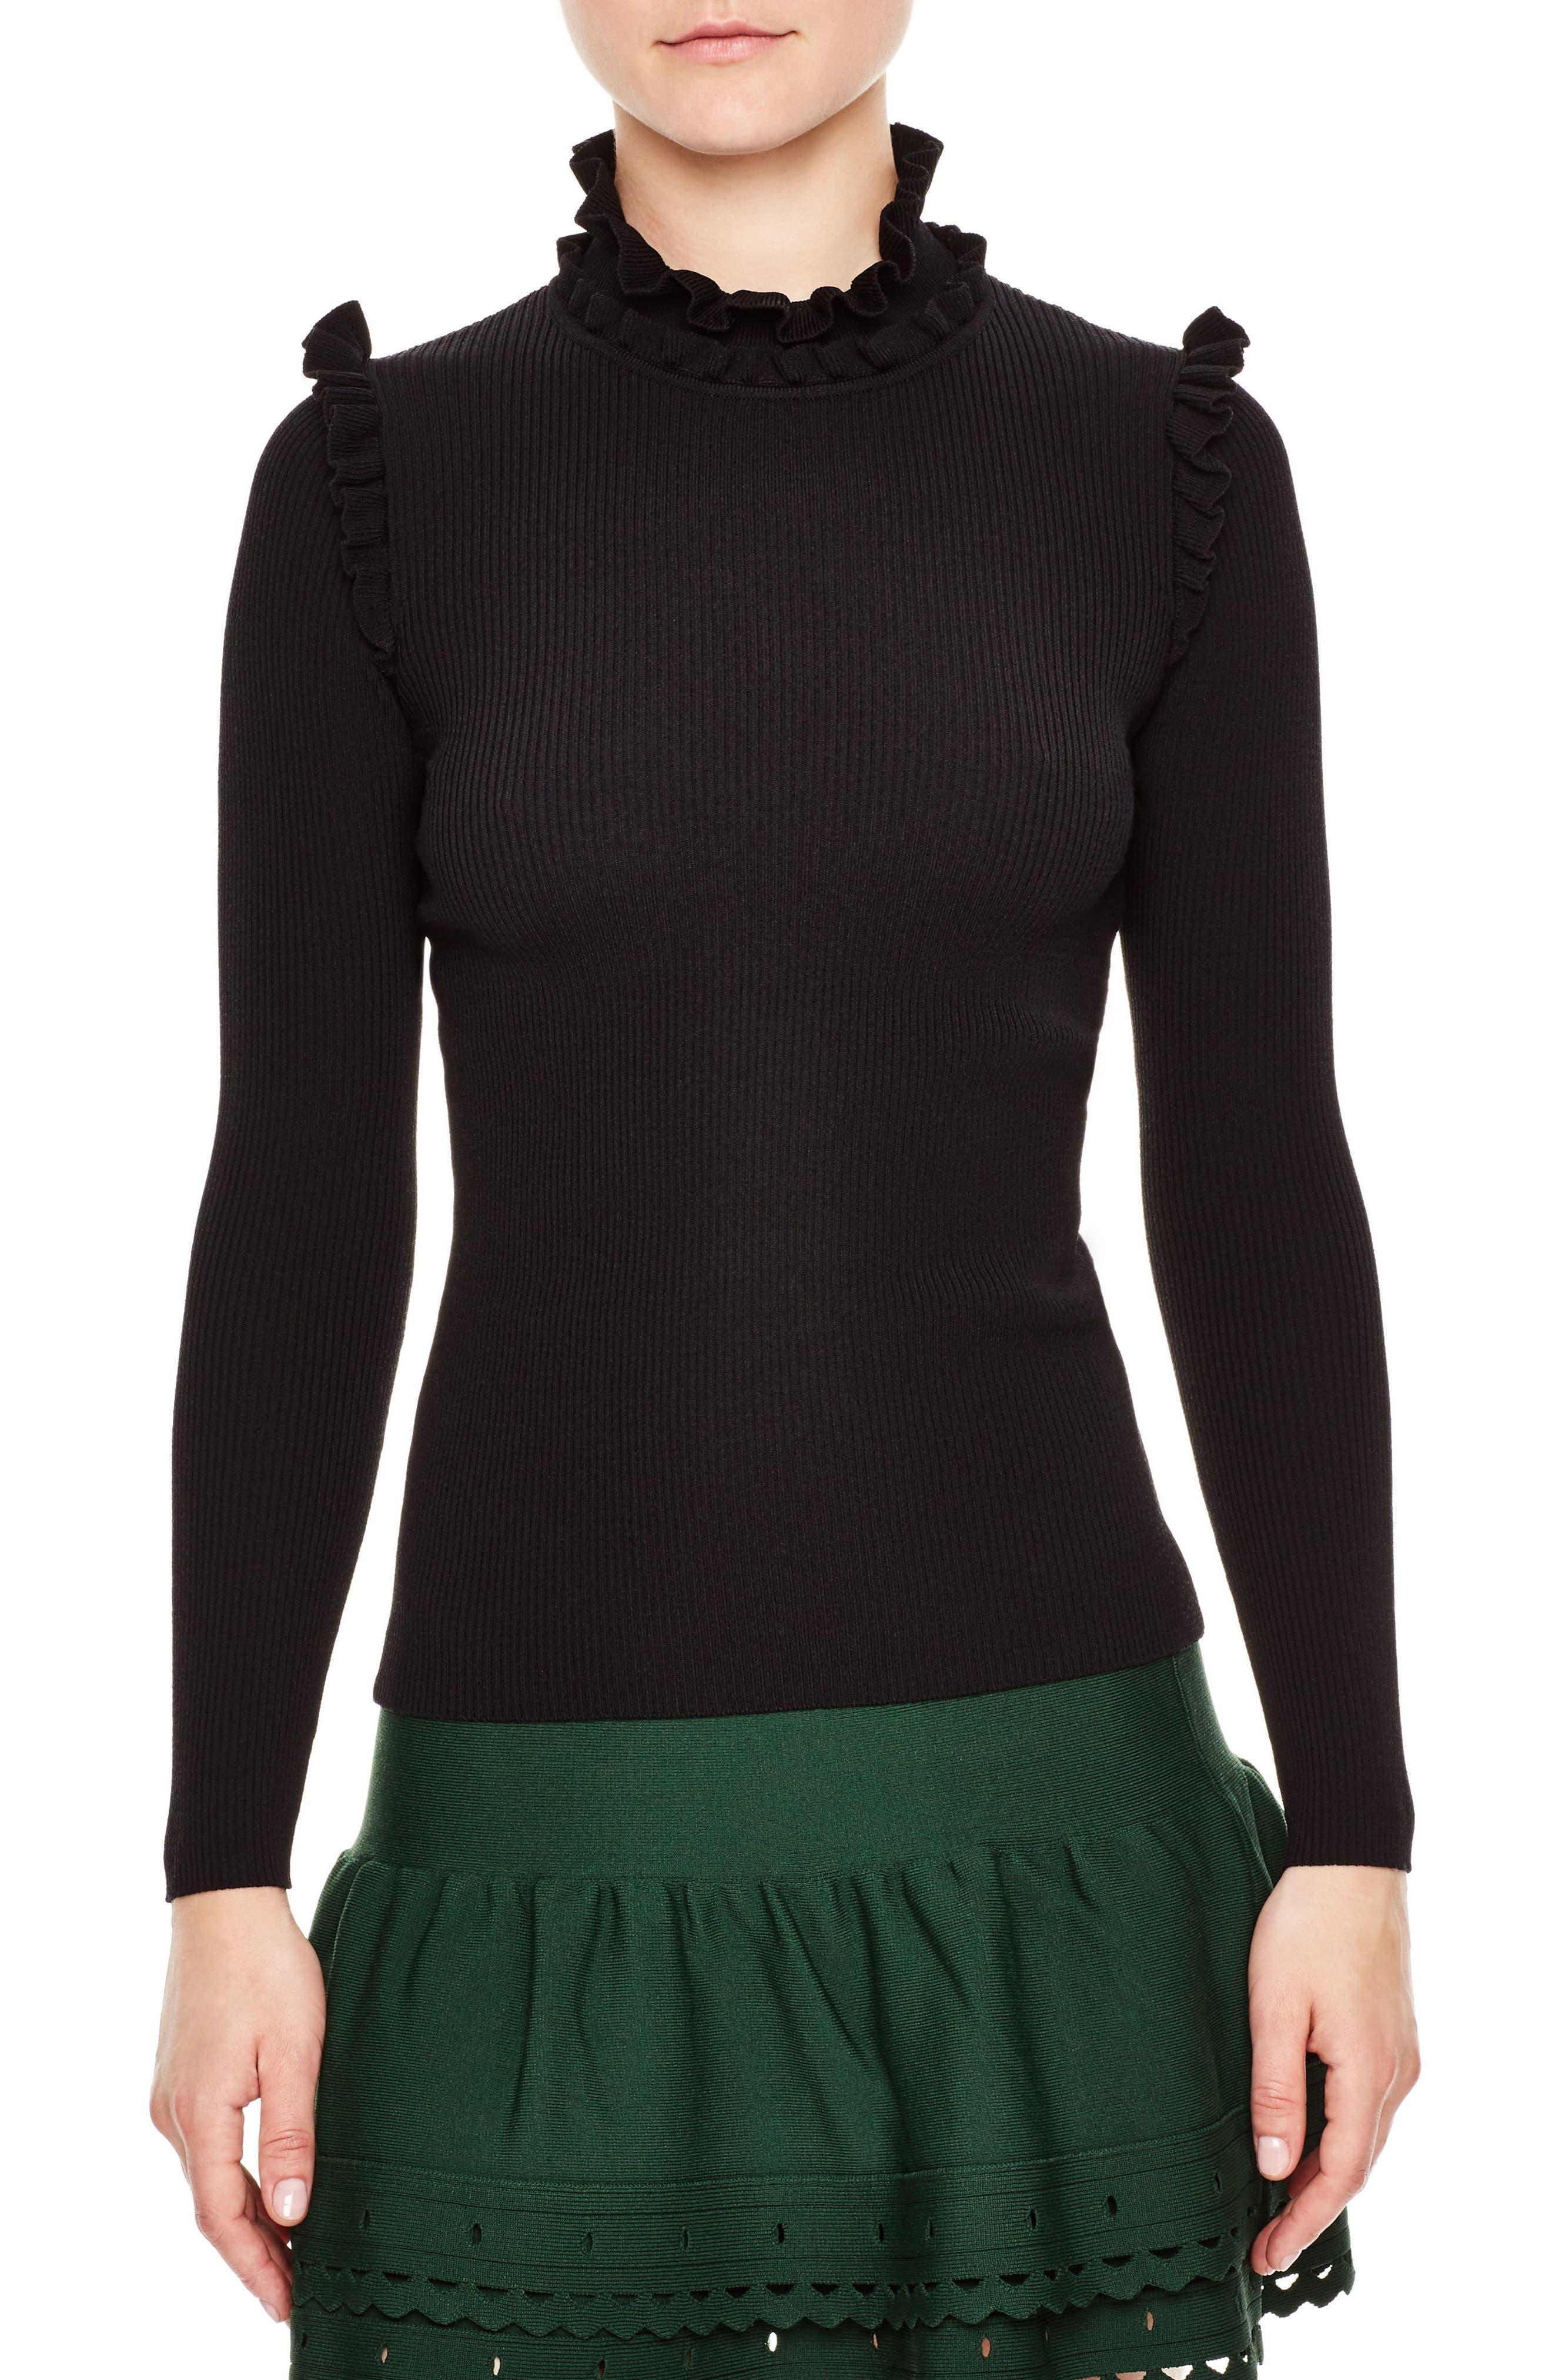 Ruffle Trim Turtleneck Sweater,                             Main thumbnail 1, color,                             001